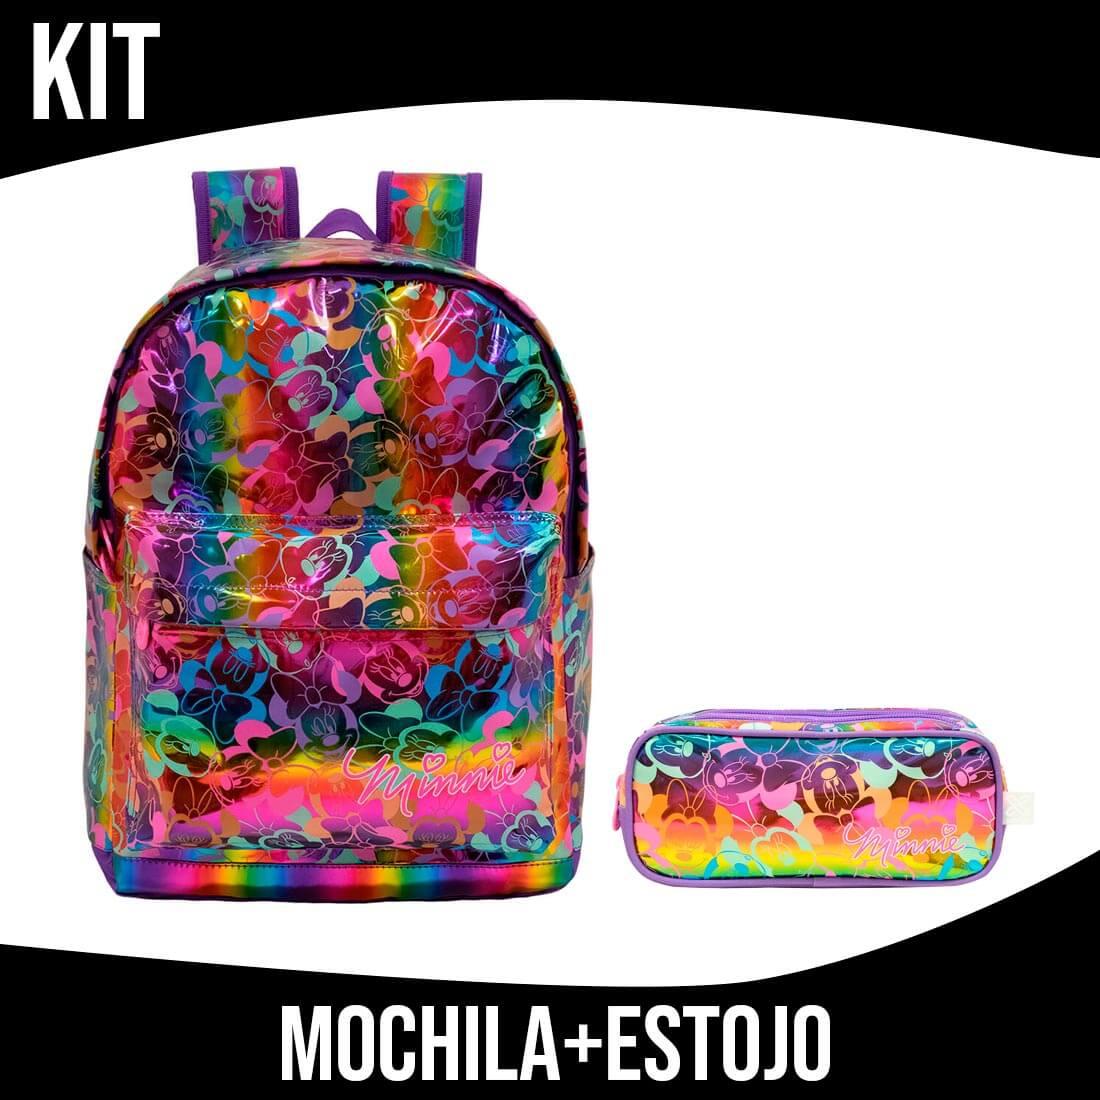 Kit Mochila Infantil Minnie Hologáfica Com Estojo Xeryus